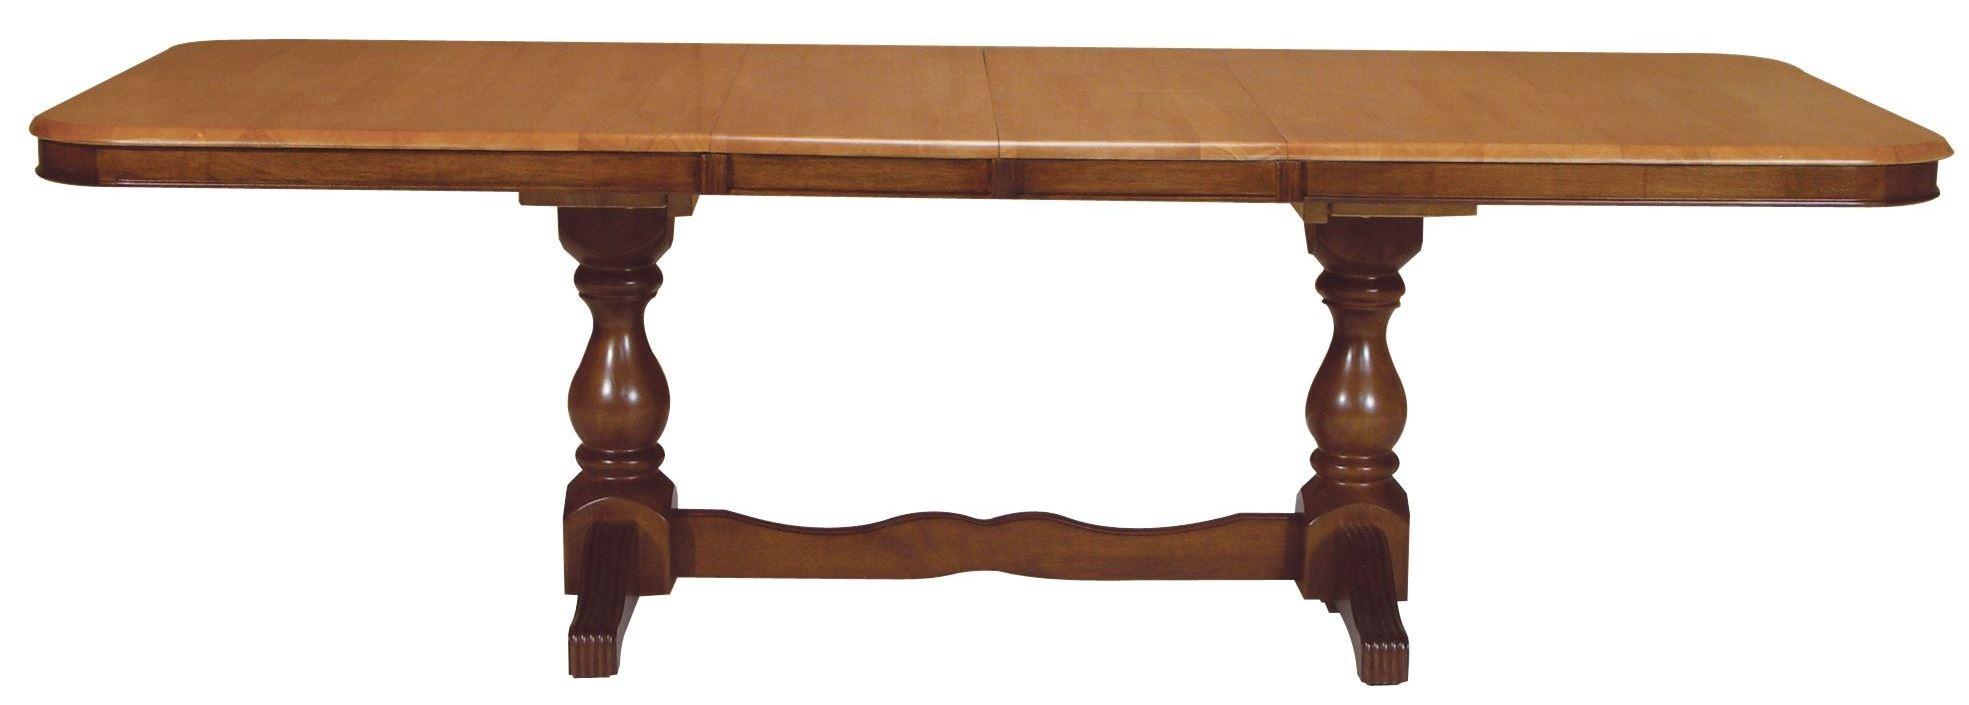 madison park cinnamon espresso rectangular double pedestal extendable dining table t58 4268xbt. Black Bedroom Furniture Sets. Home Design Ideas